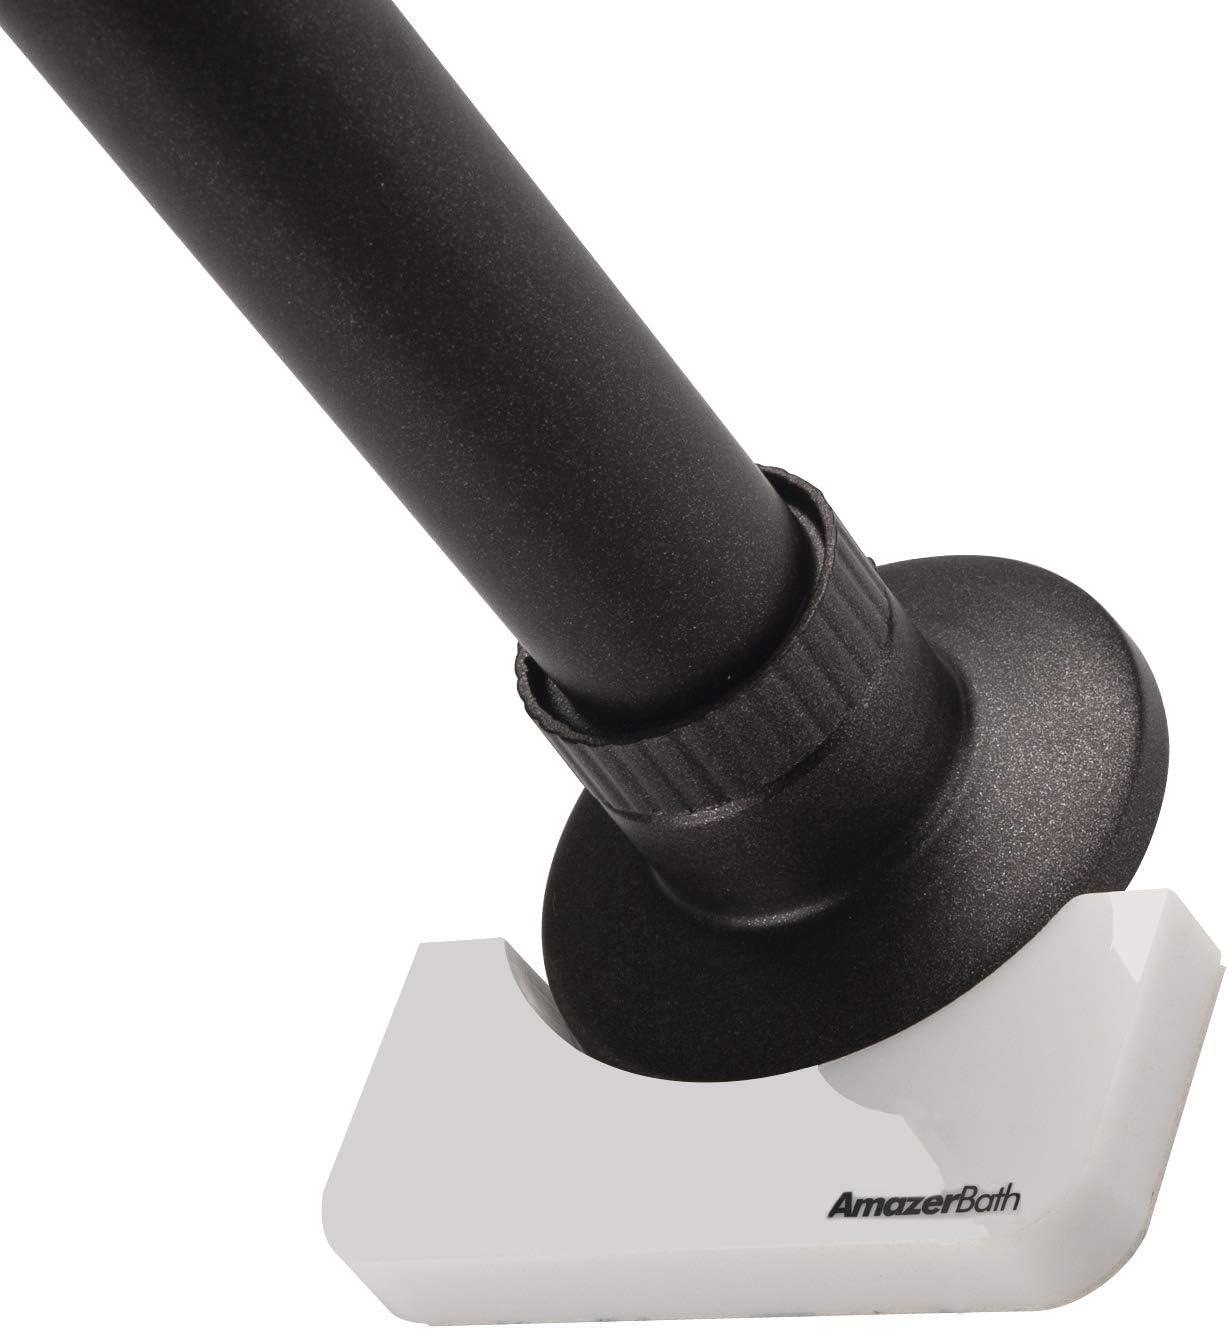 AmazerBath Shower Rod Holders Adhesive Indefinitely Raleigh Mall Bathroom Holder